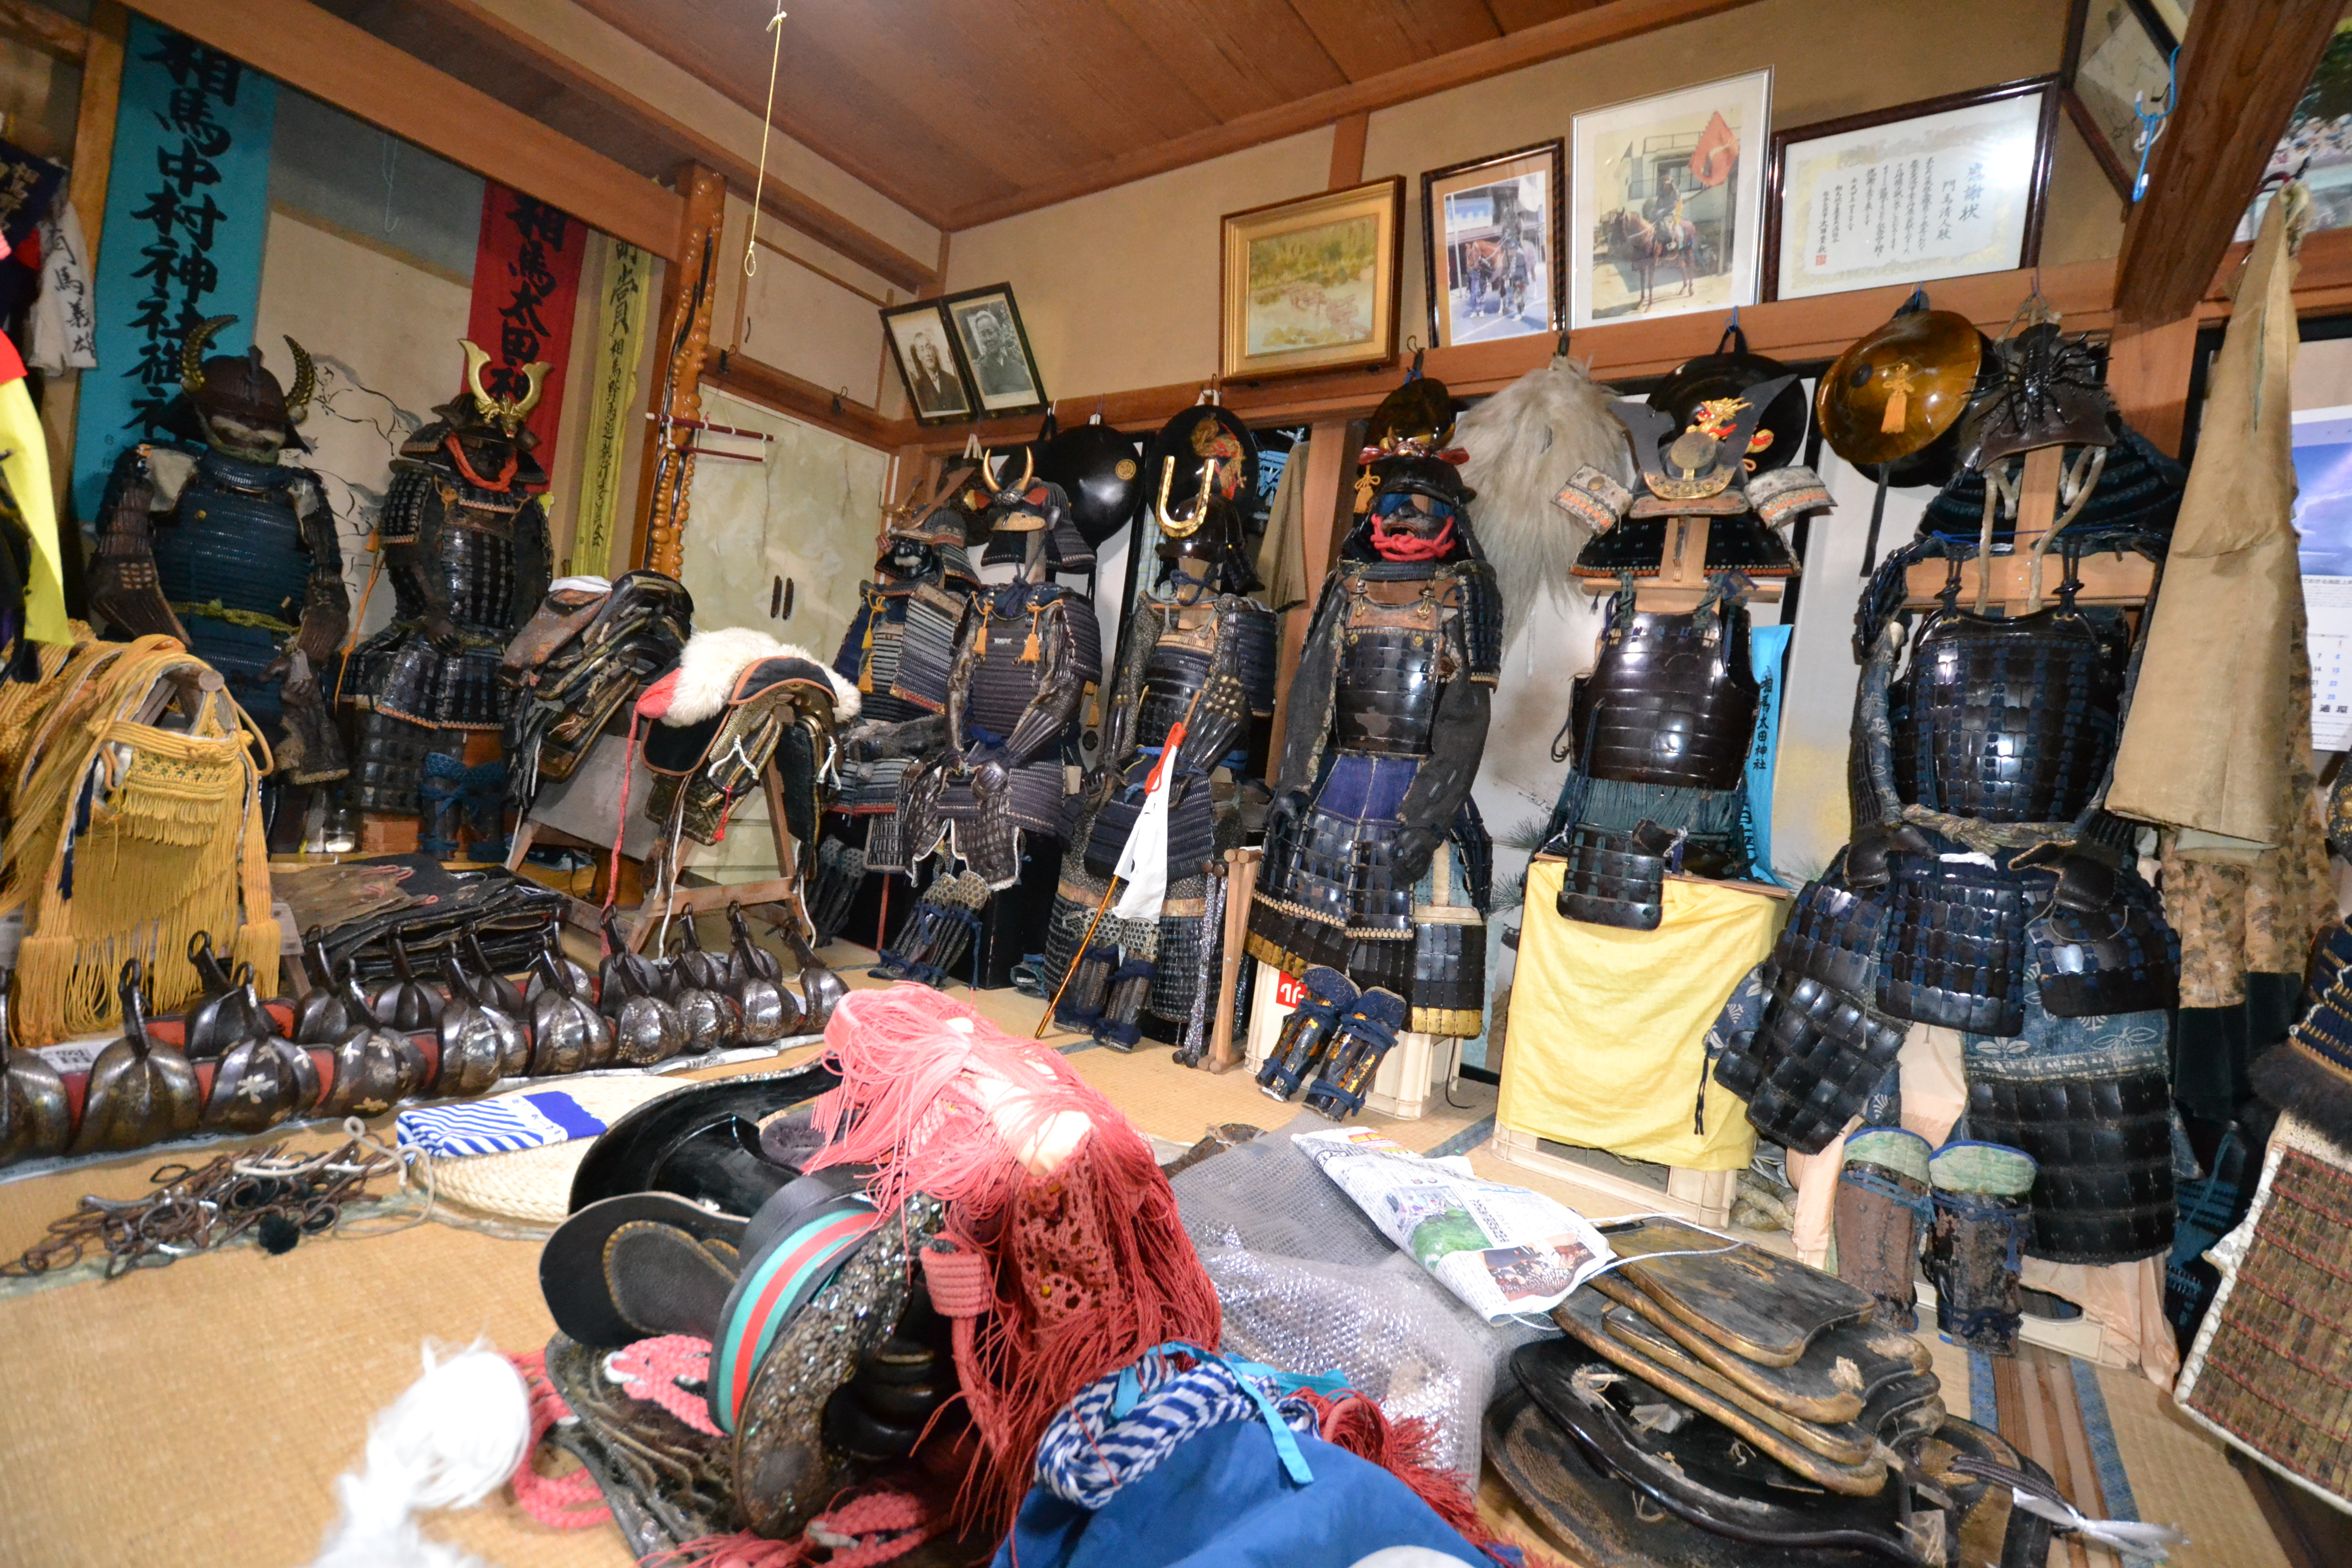 minamisoma samurai home WIDE with armor.JPG